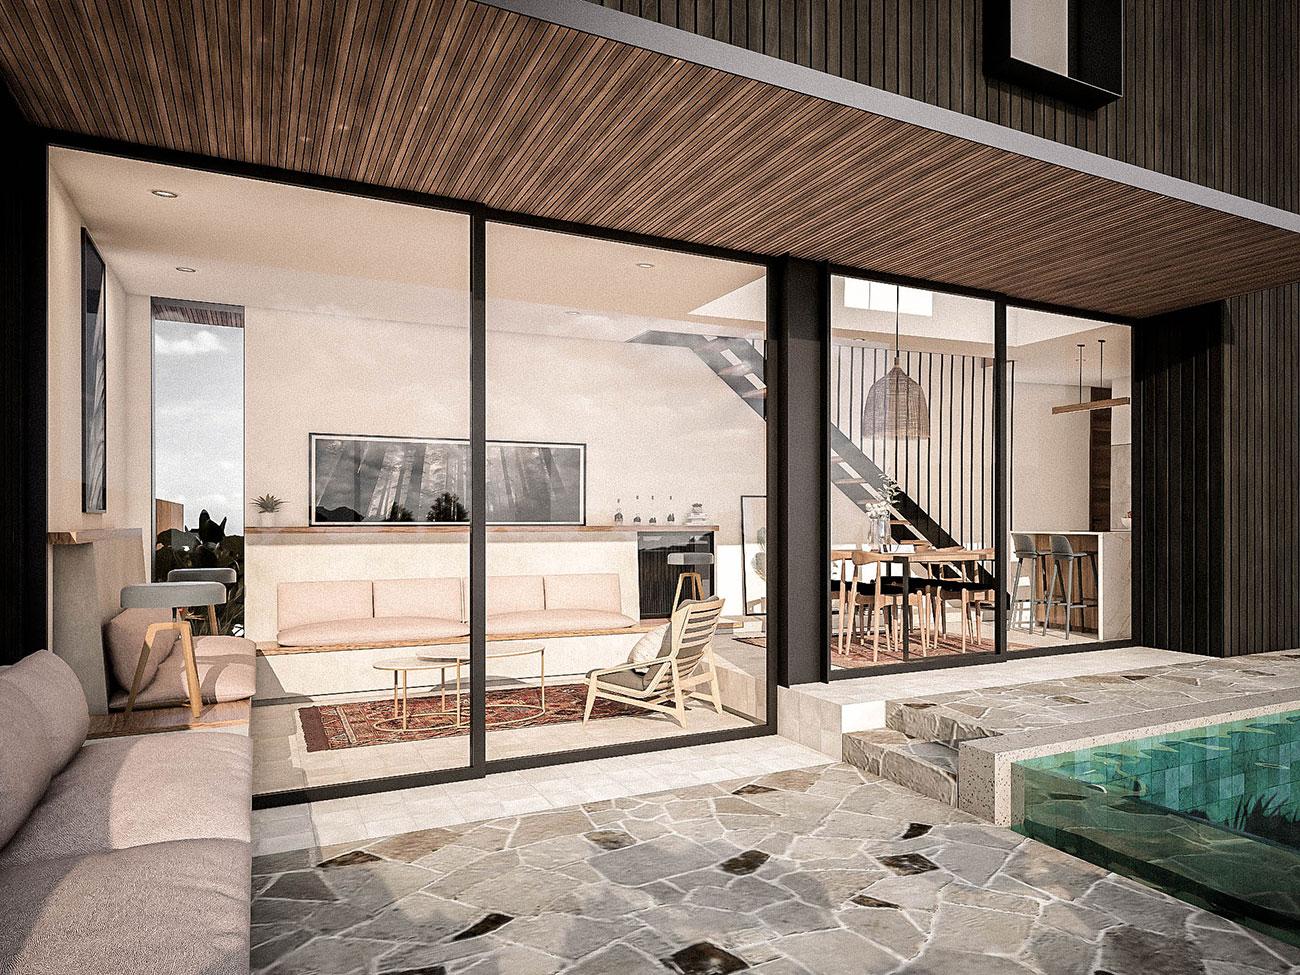 House-B-interior-1